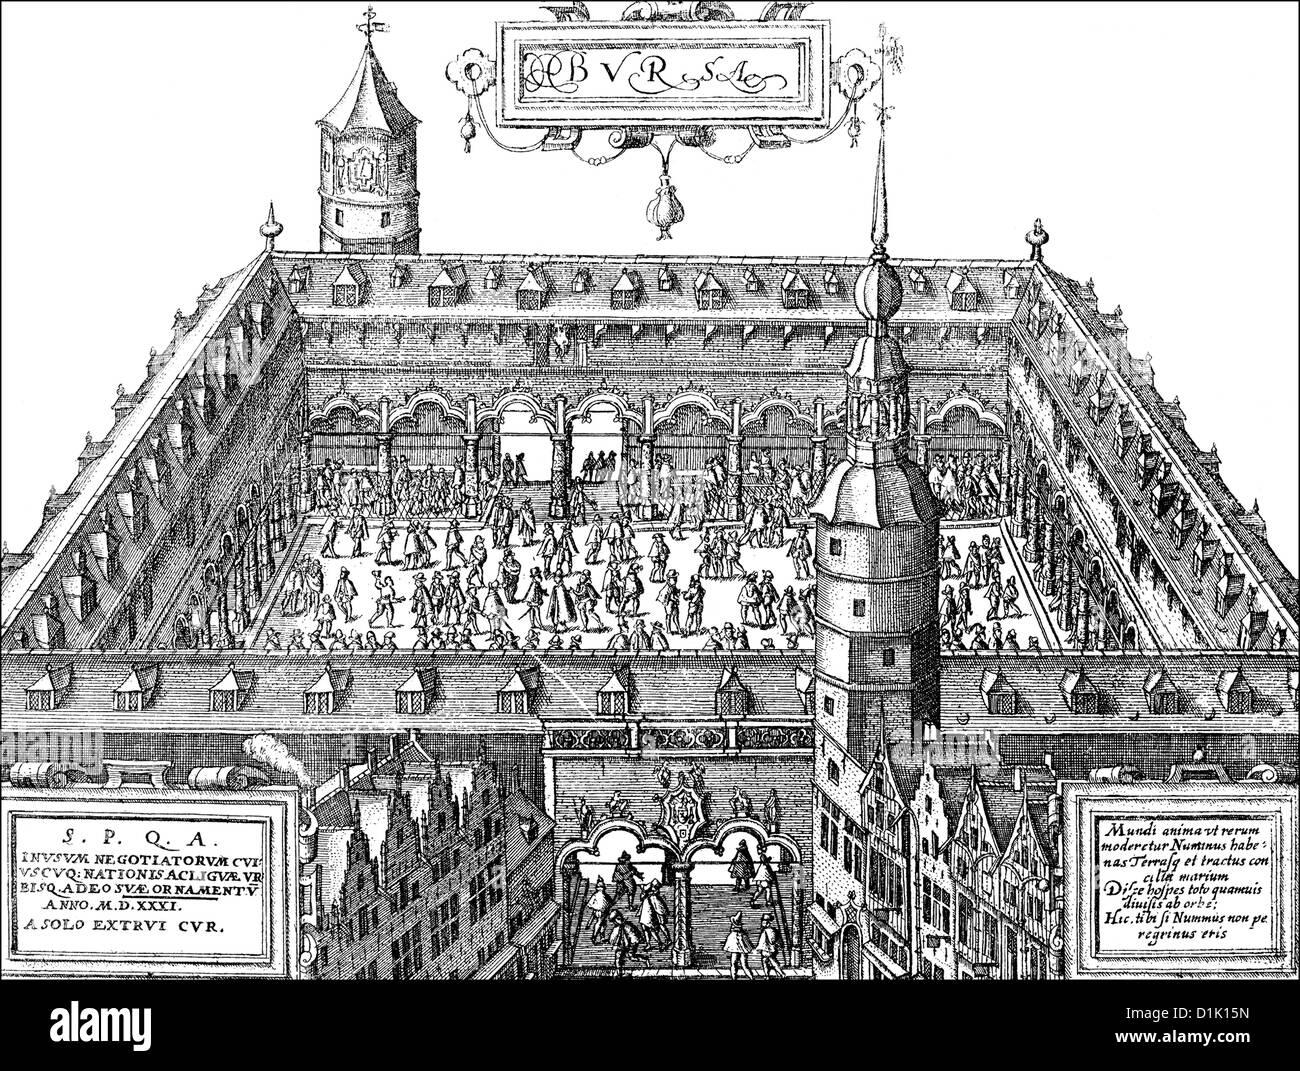 illustration of the trade exchange in Antwerp, 16th century, Belgium, Europe, - Stock Image